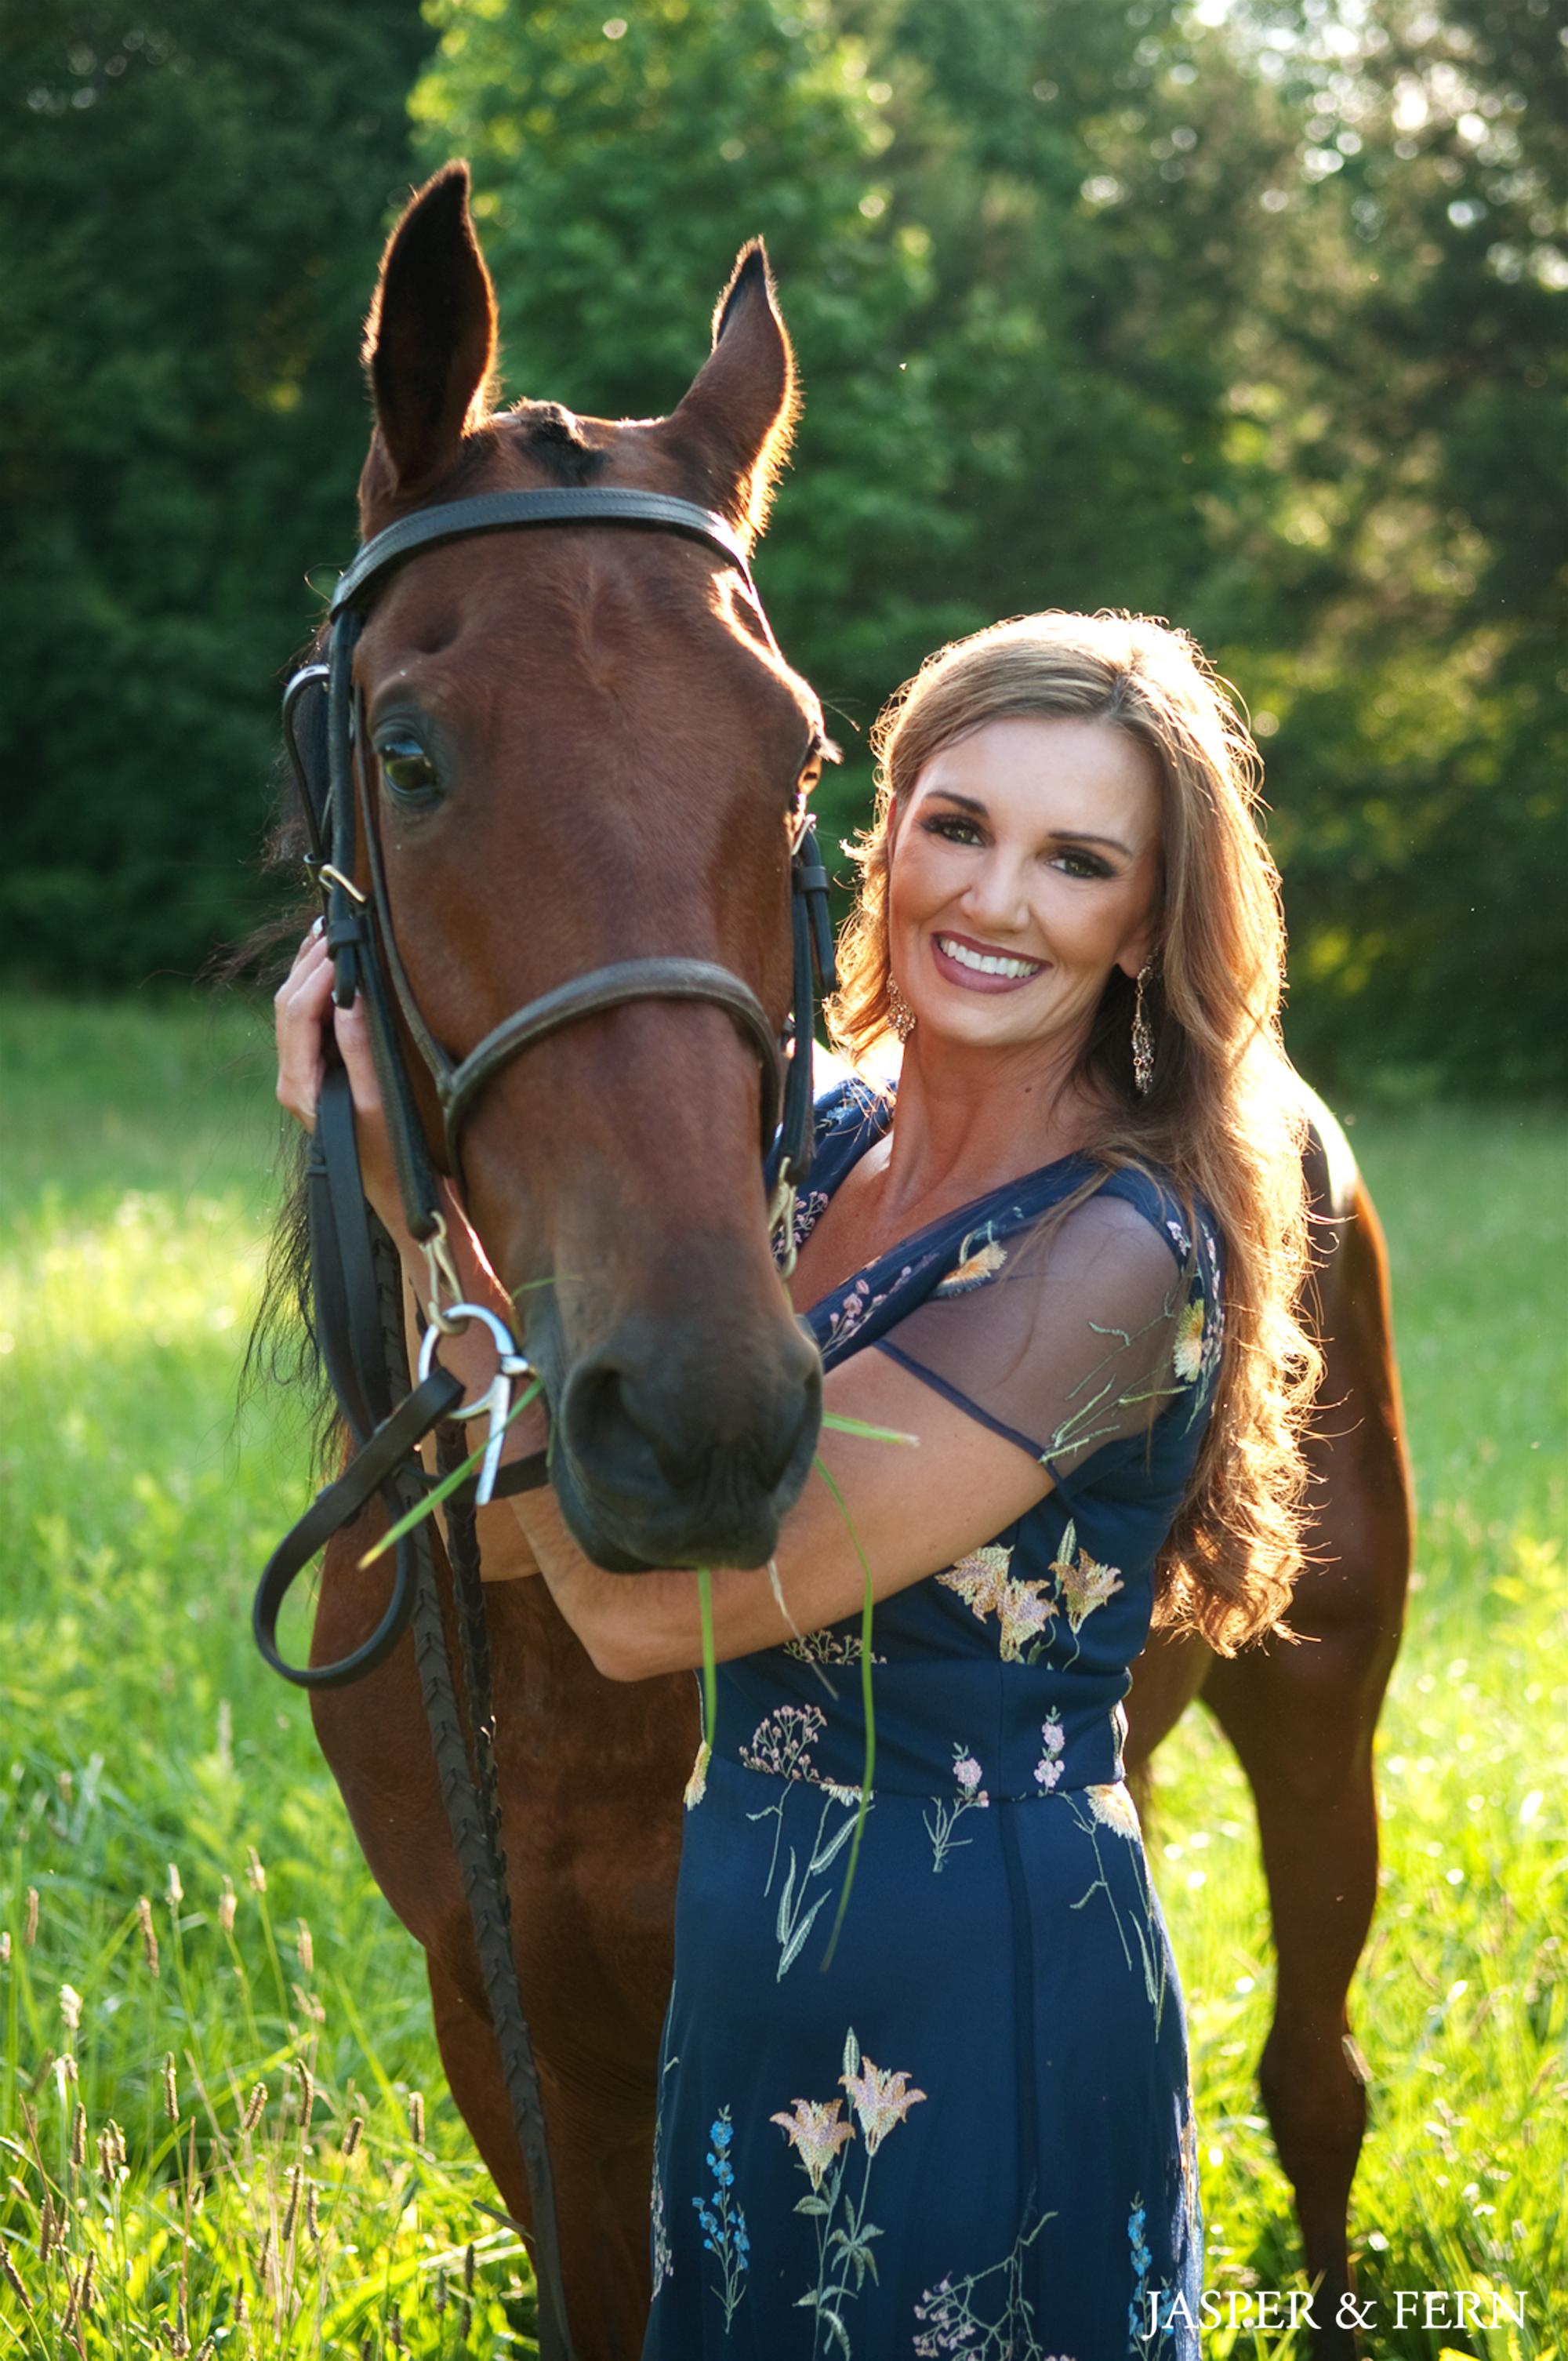 Horse Blog Jasper Fern